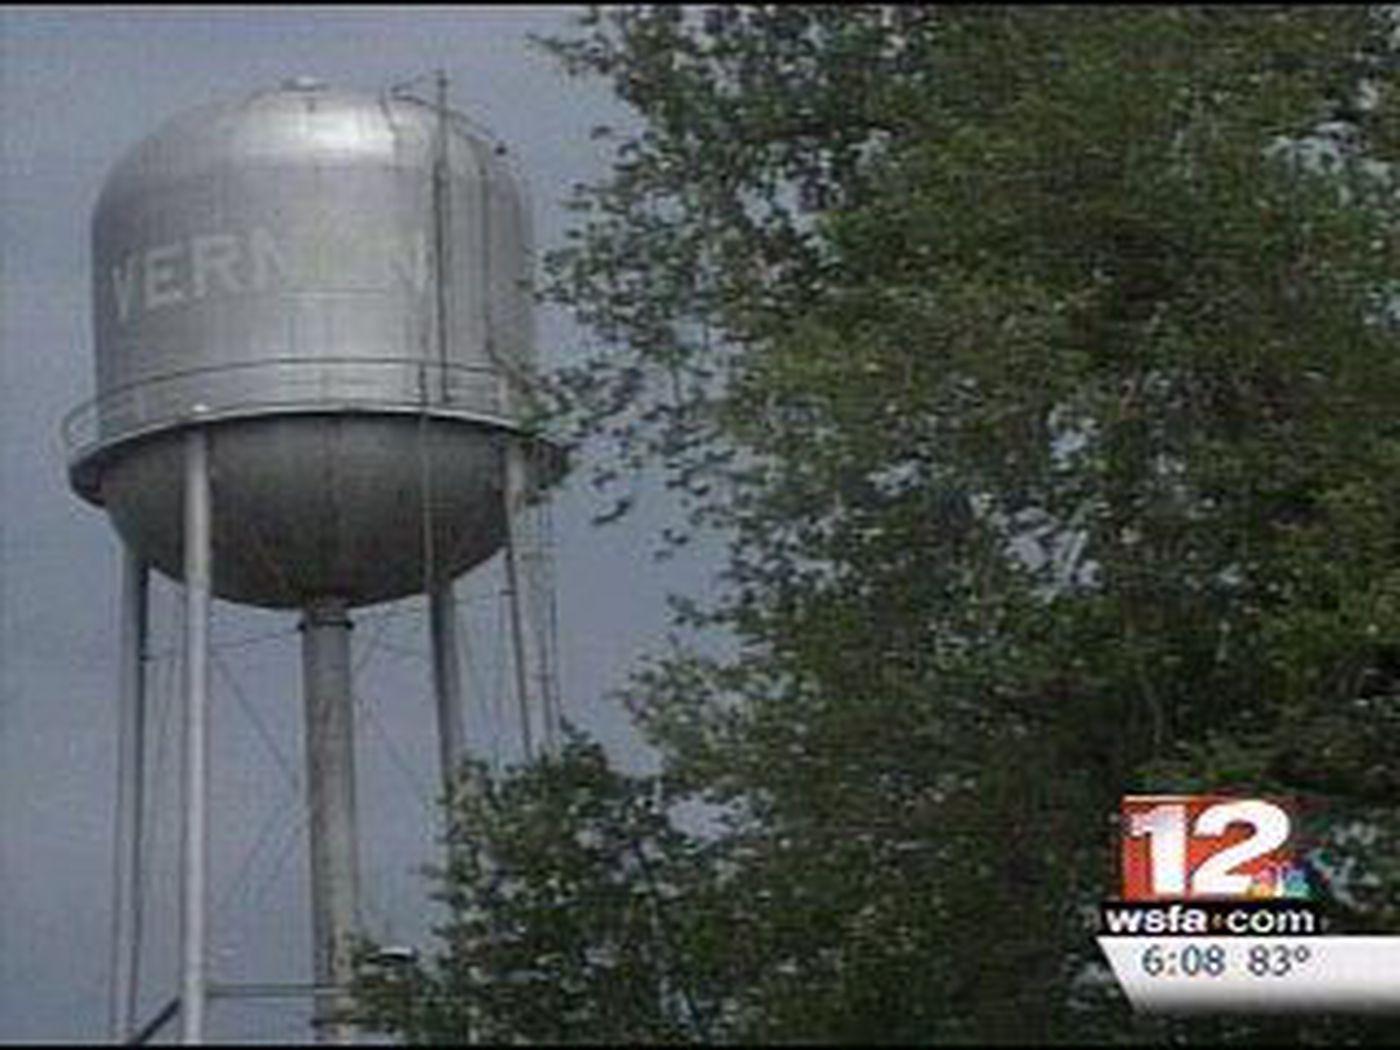 New Alabama Thyssenkrupp Steel Plant Makes Groundbreaking